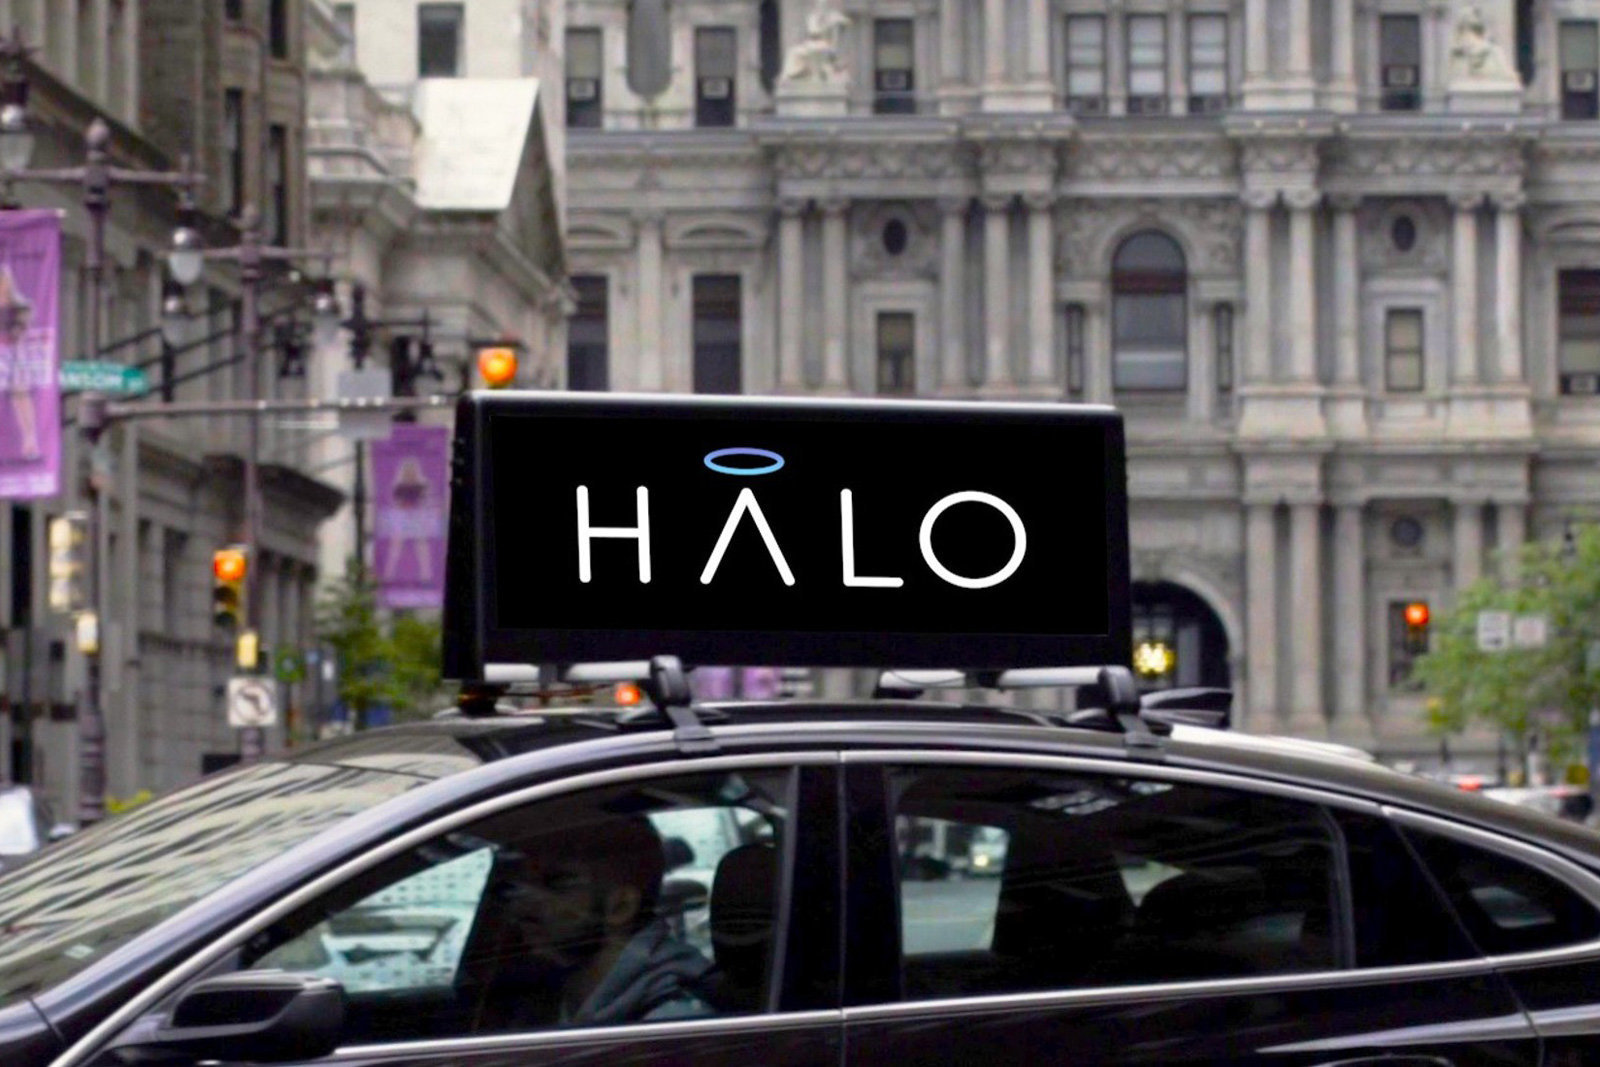 Lyft buys a startup that runs ads on top of ridesharing carsLyft公司收购美国车顶广告公司Halo Cars